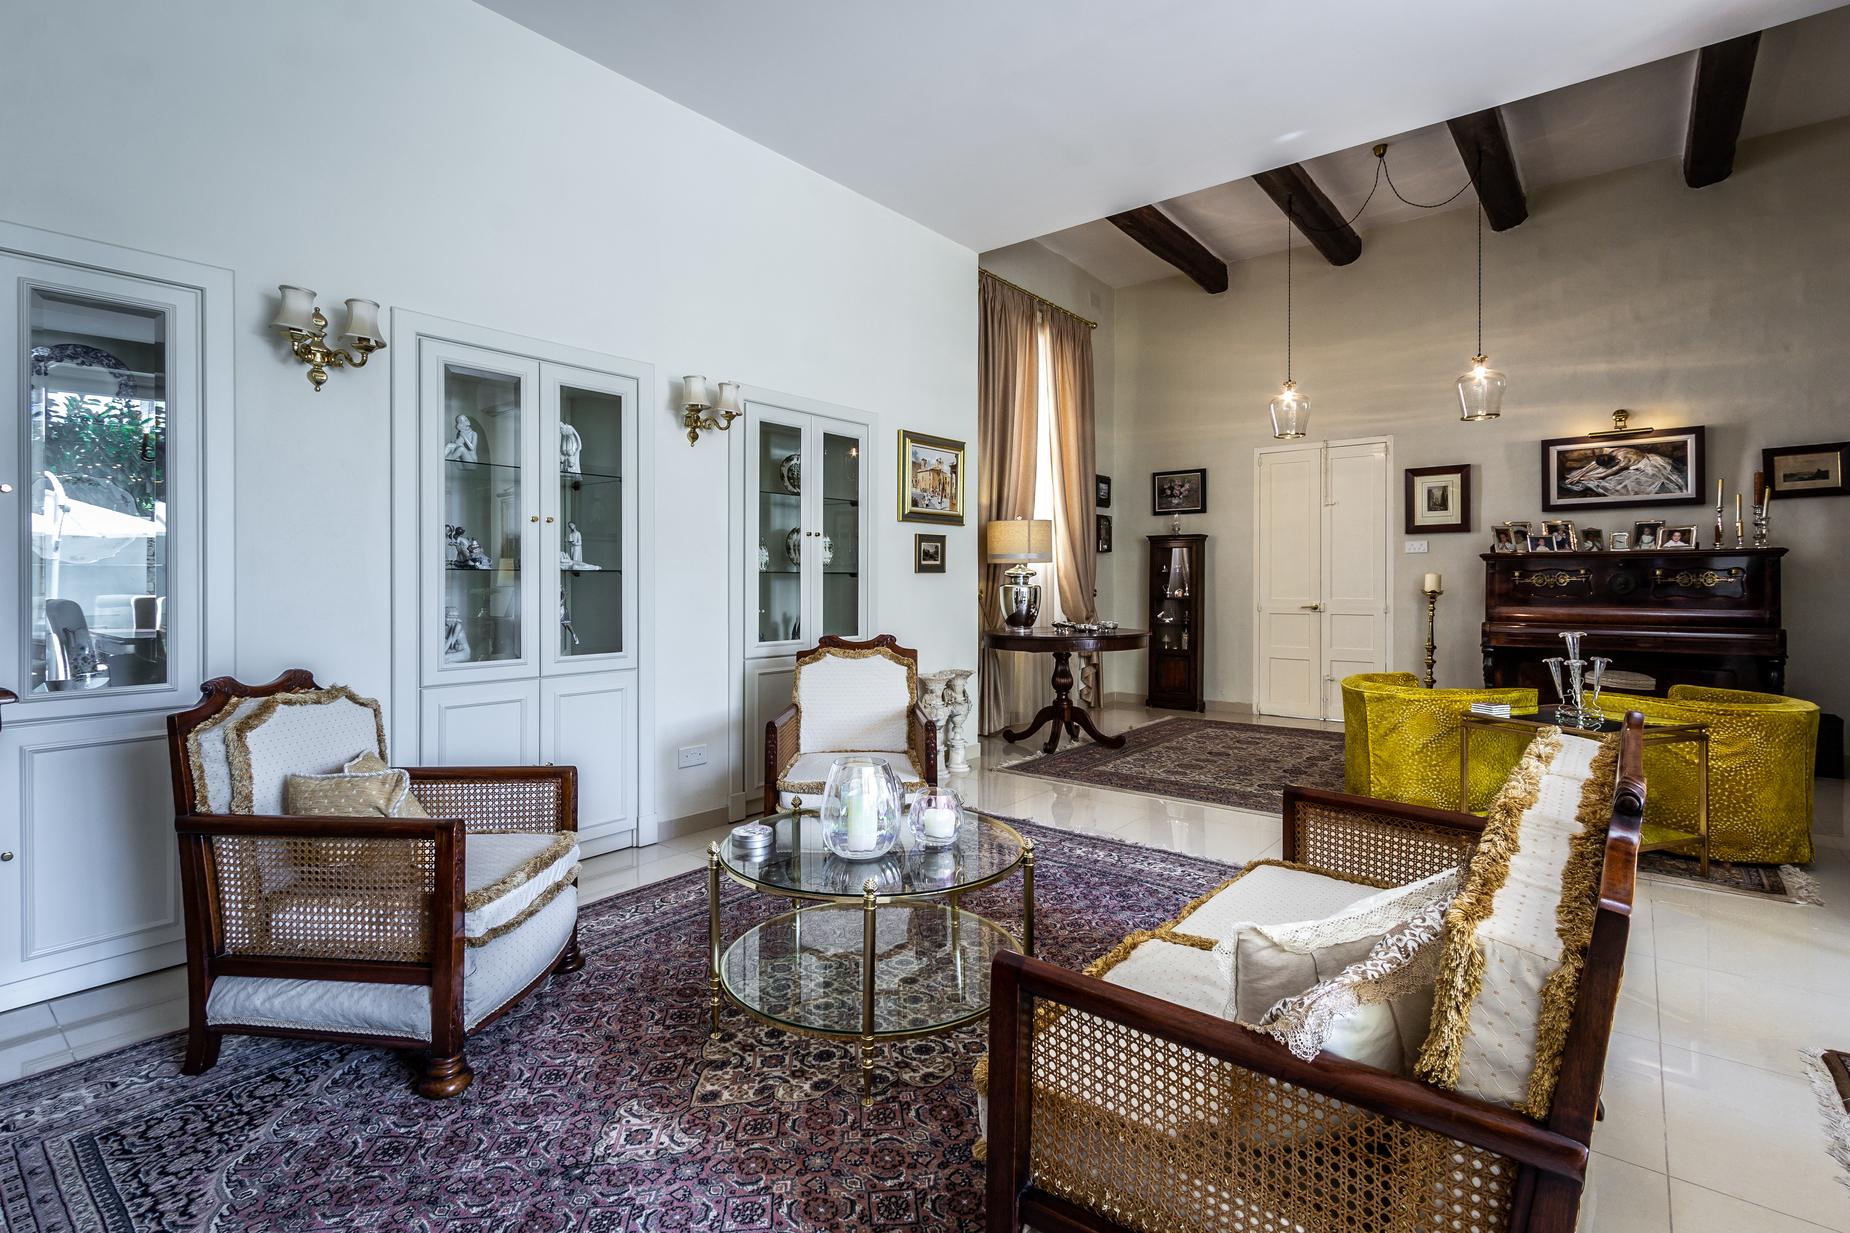 3 bed Town House For Sale in Balzan, Balzan - thumb 6